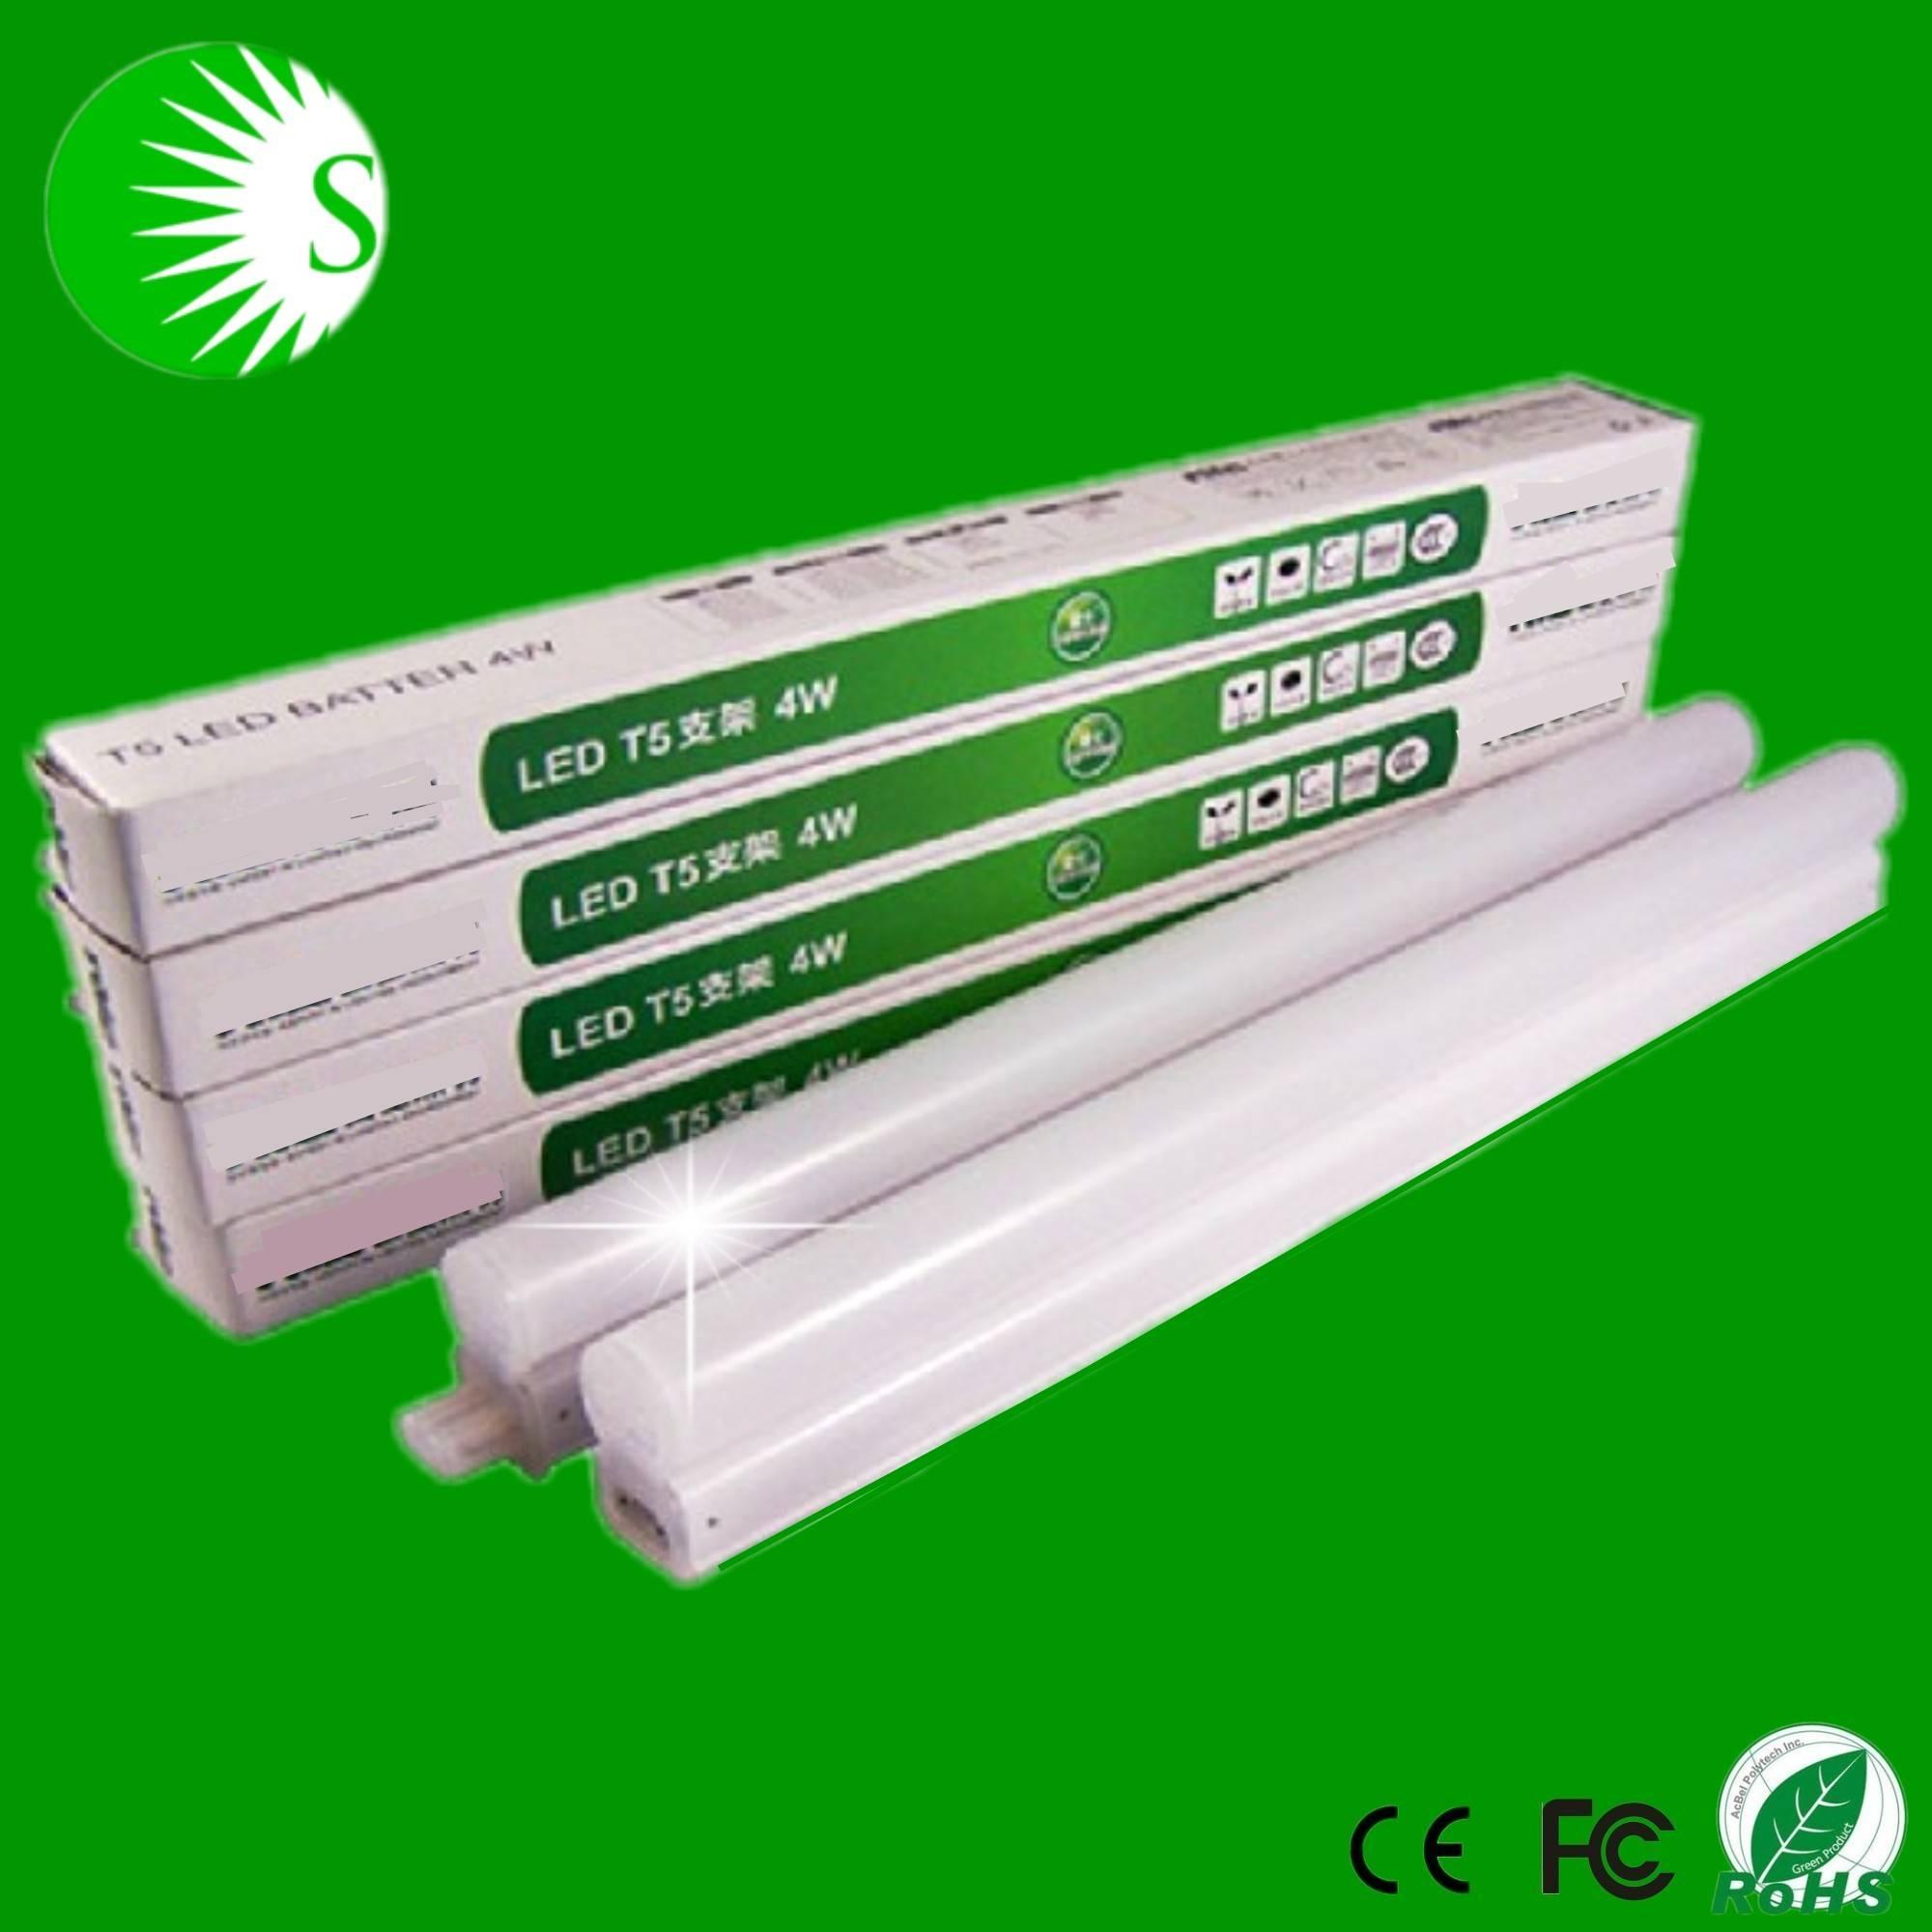 wide voltage AC85-265V CRI80 Epister led SMD2835 7w tube5 led light tube